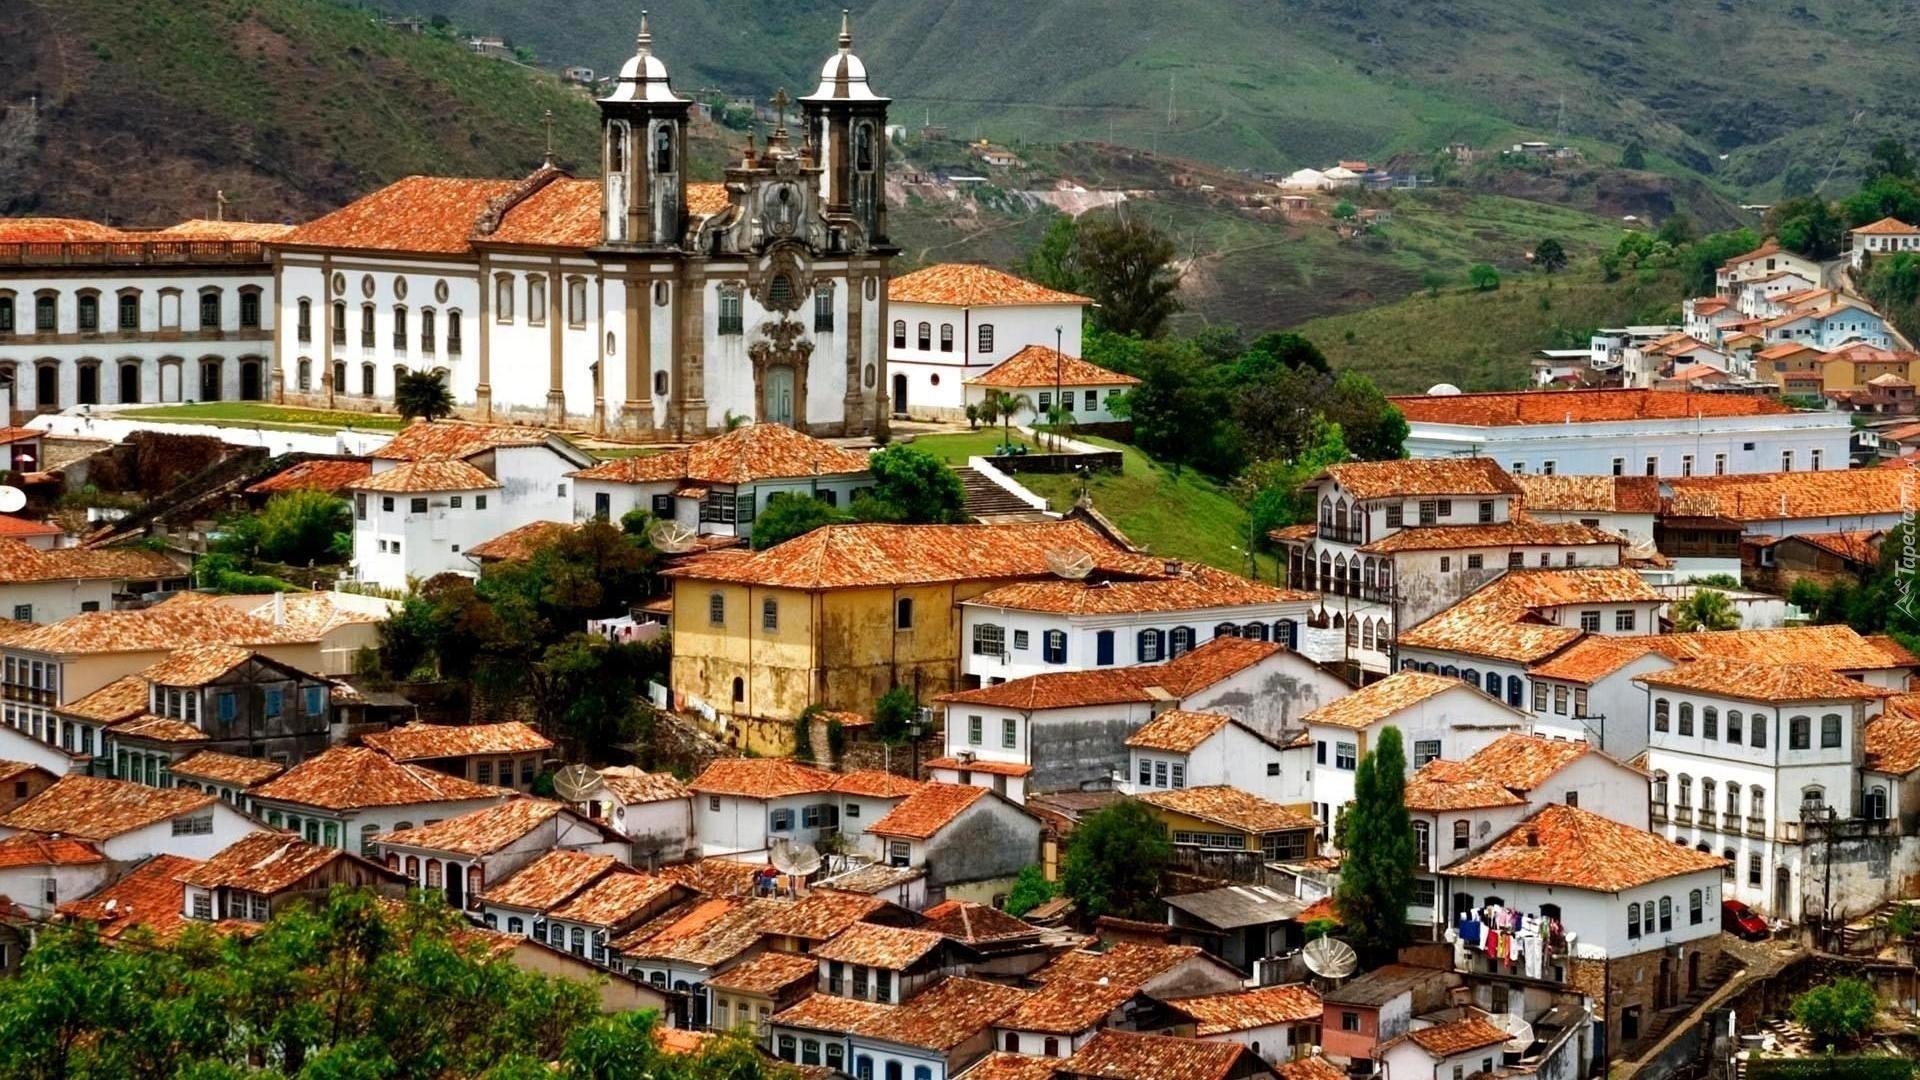 Brazylia Ouro Preto Domy Ko U015bci U00f3 U0142